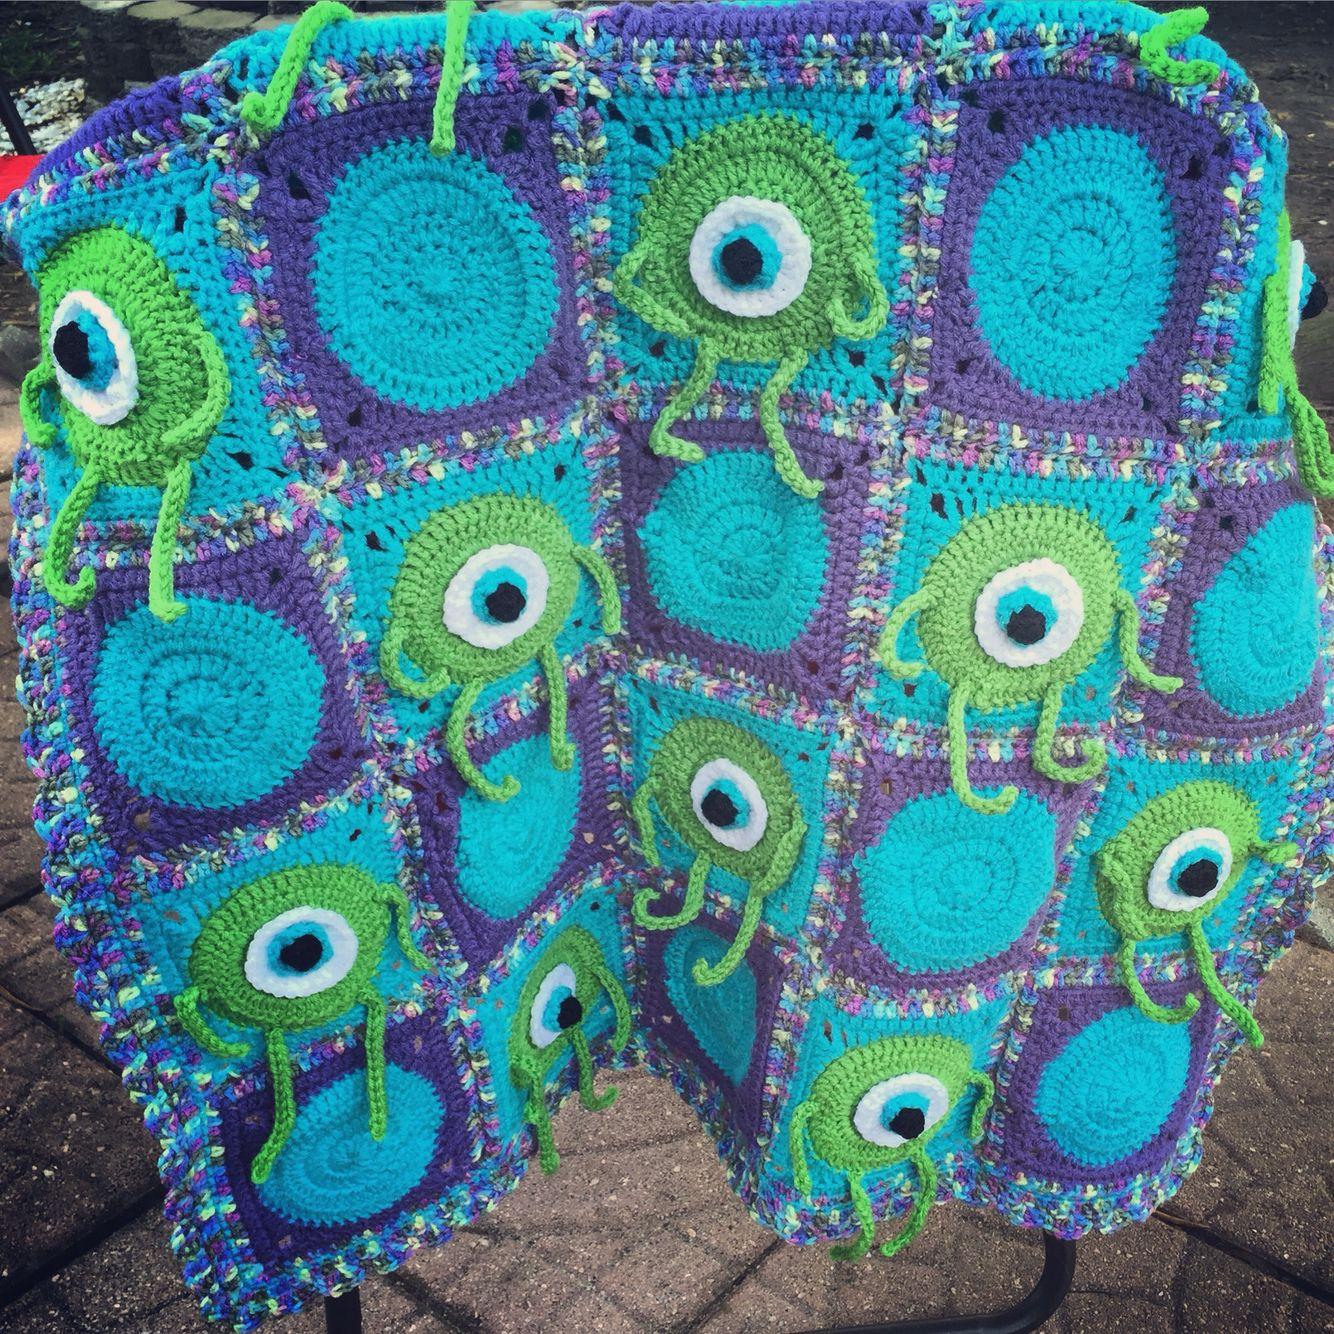 Monsters Inc Mike Wazowski Blanket Handmade By Creekwood Crochet